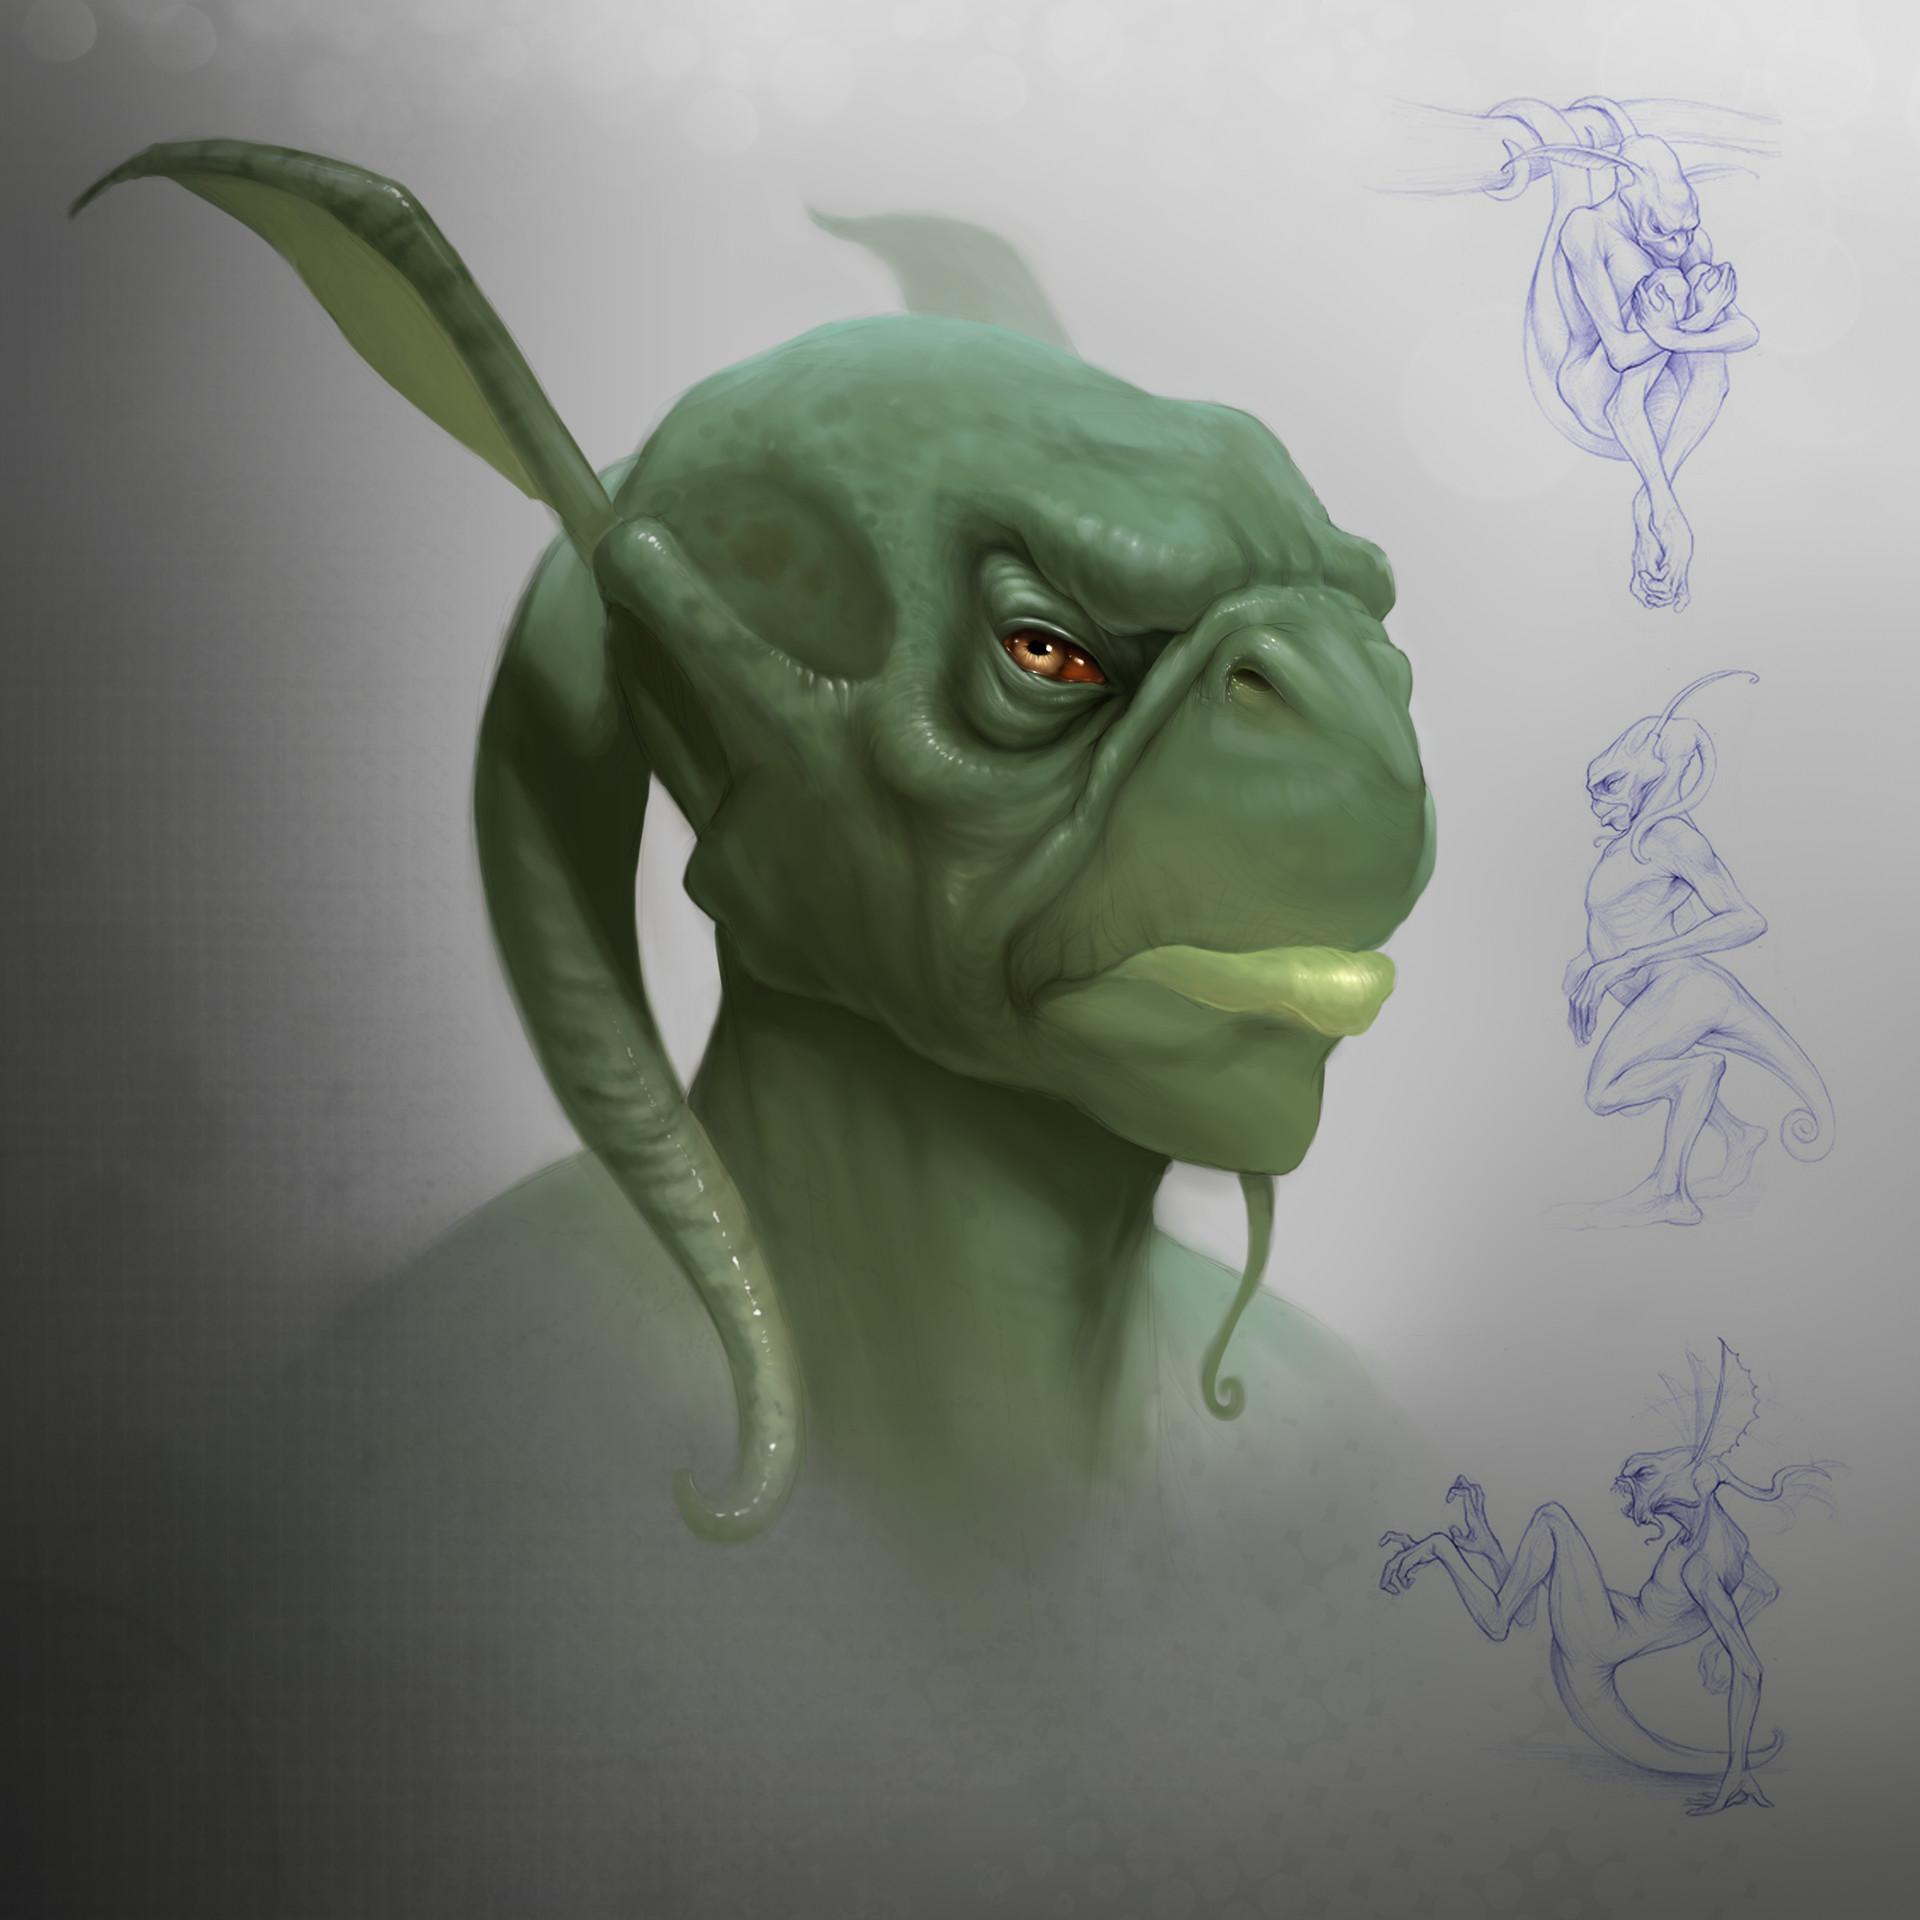 Creature Head Study